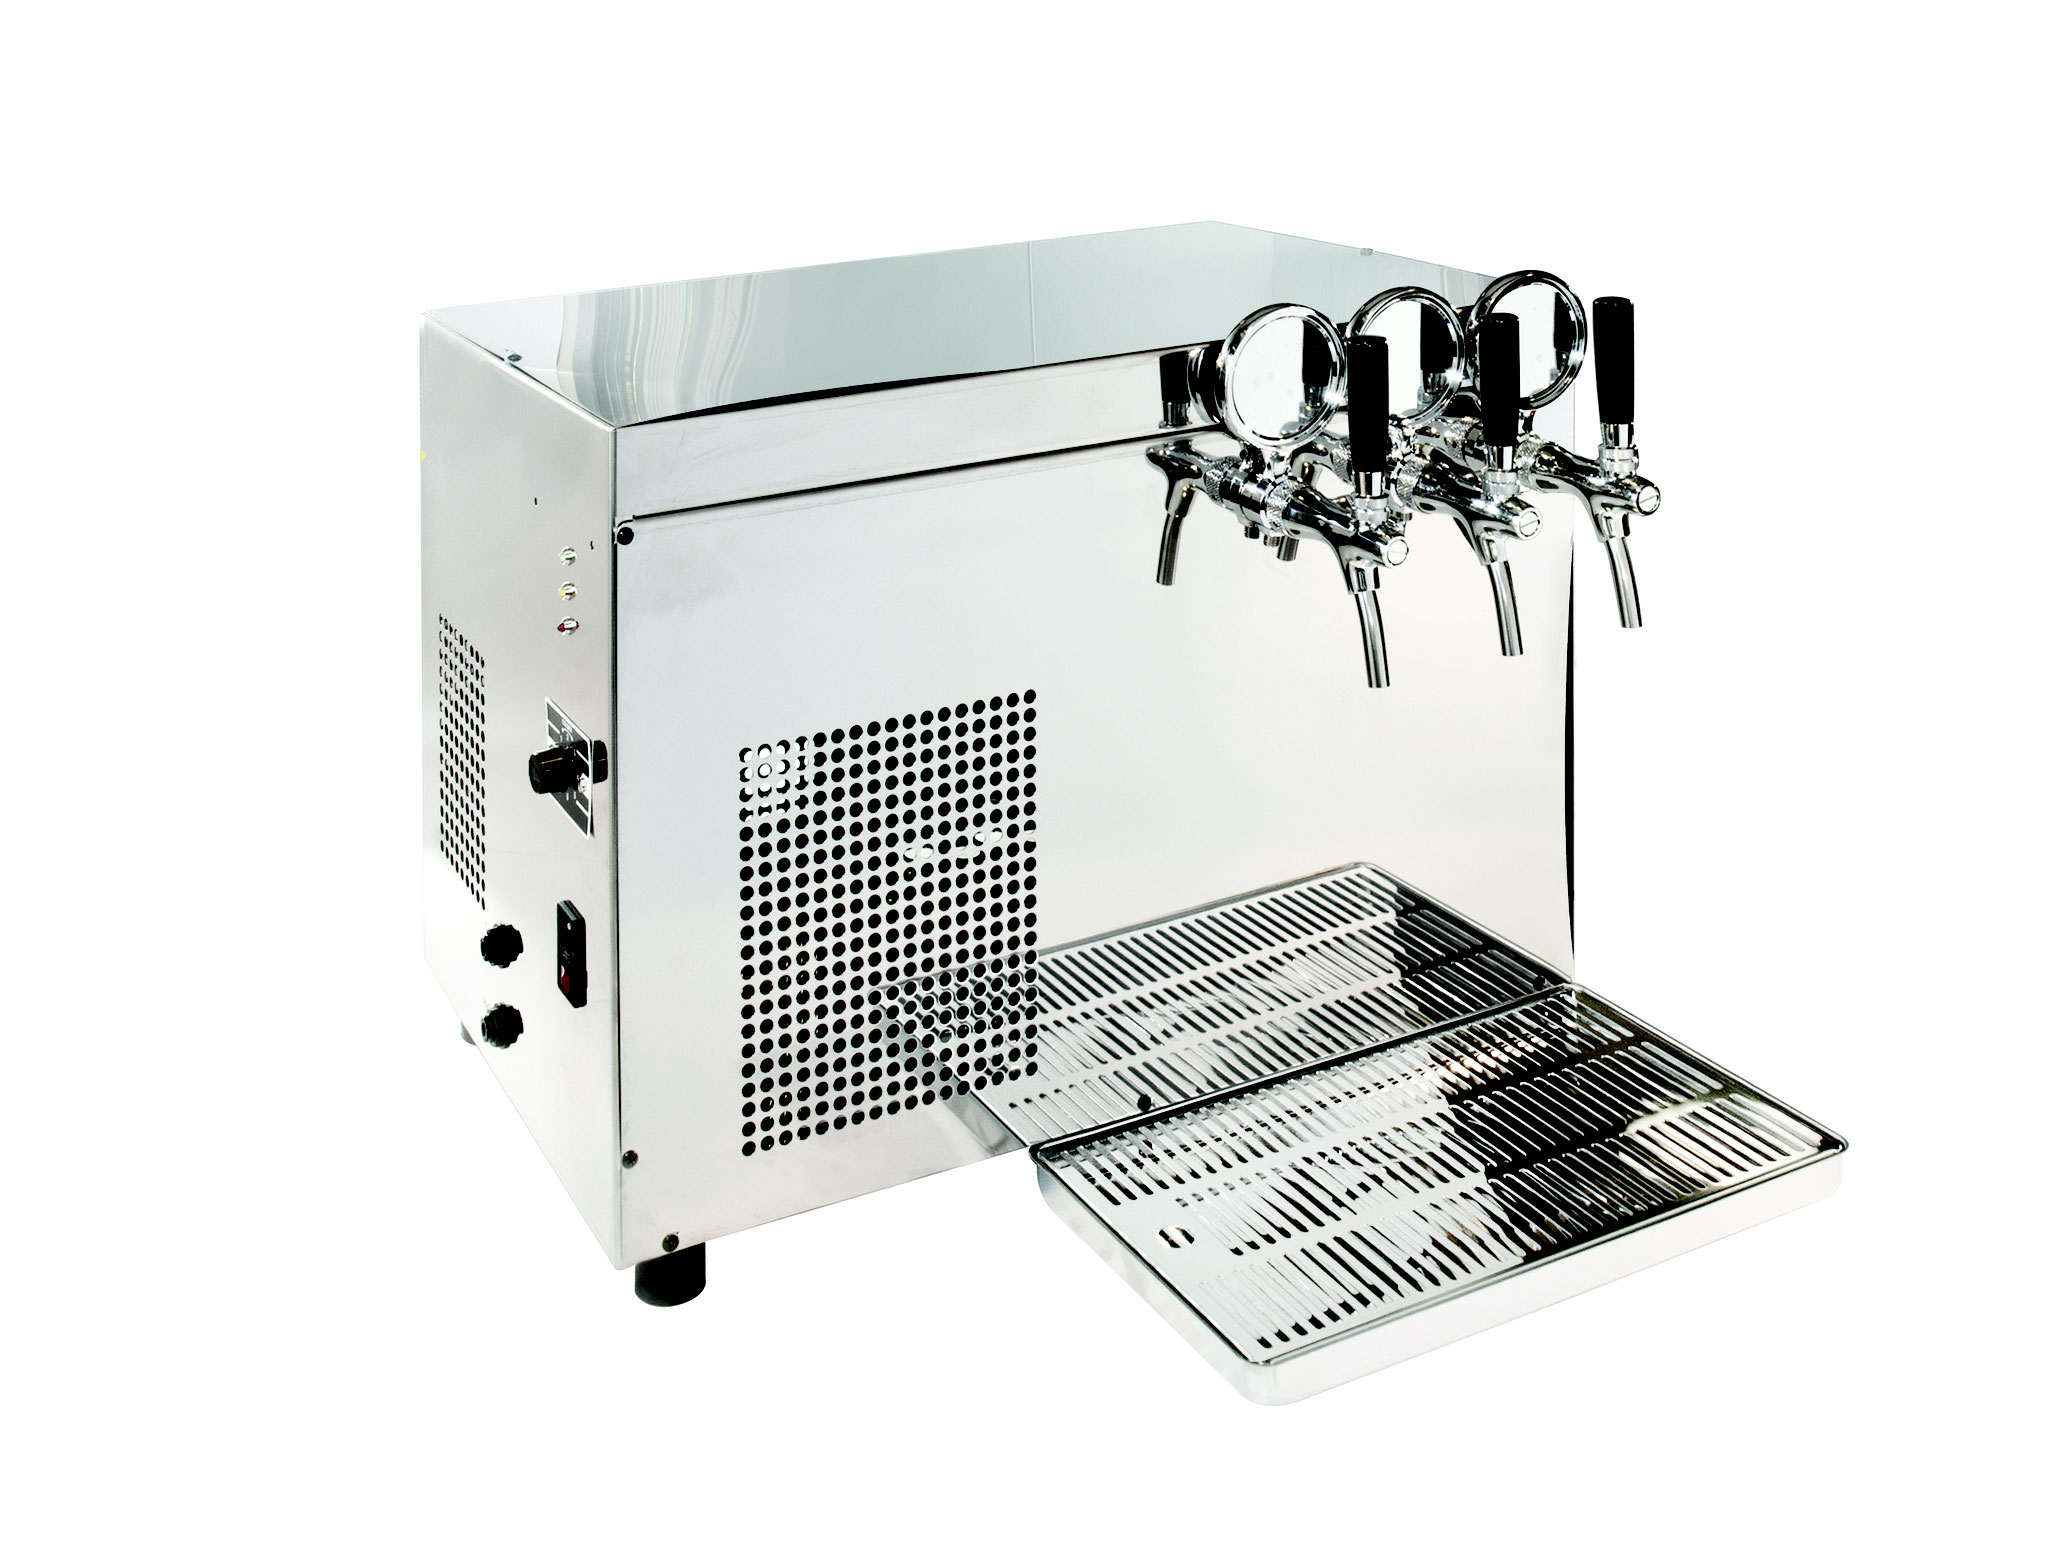 Refrigeratore Professionale